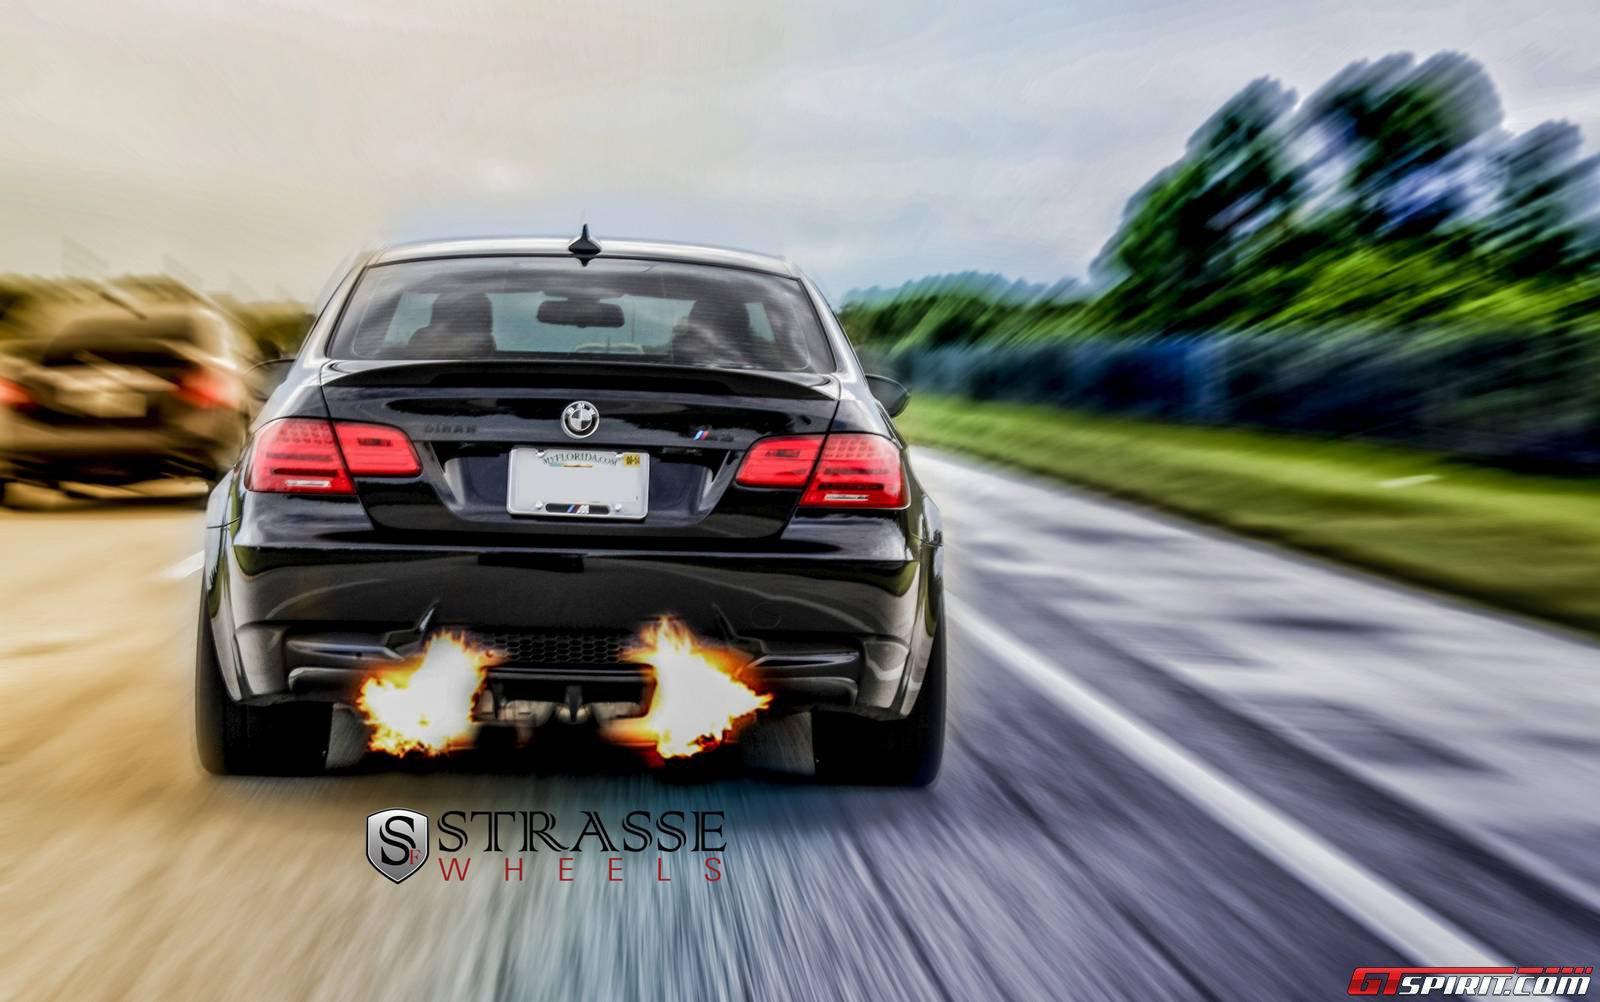 http://www.gtspirit.com/wp-content/gallery/strasse-wheels-bmw-m3/strasse-wheels-bmw-e92-m3-performance-series-sm7-step-lip-15.jpg